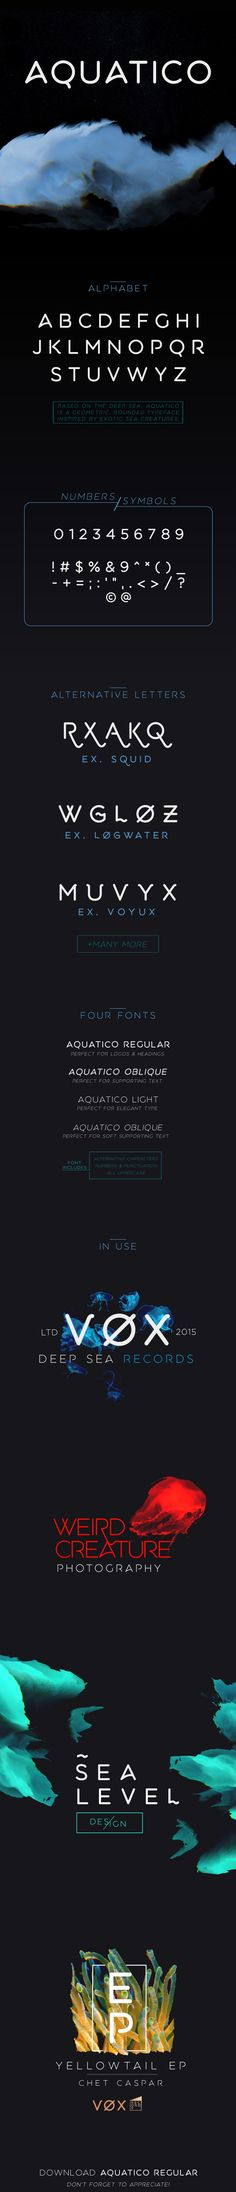 Aquatico - Free Typeface on Behance